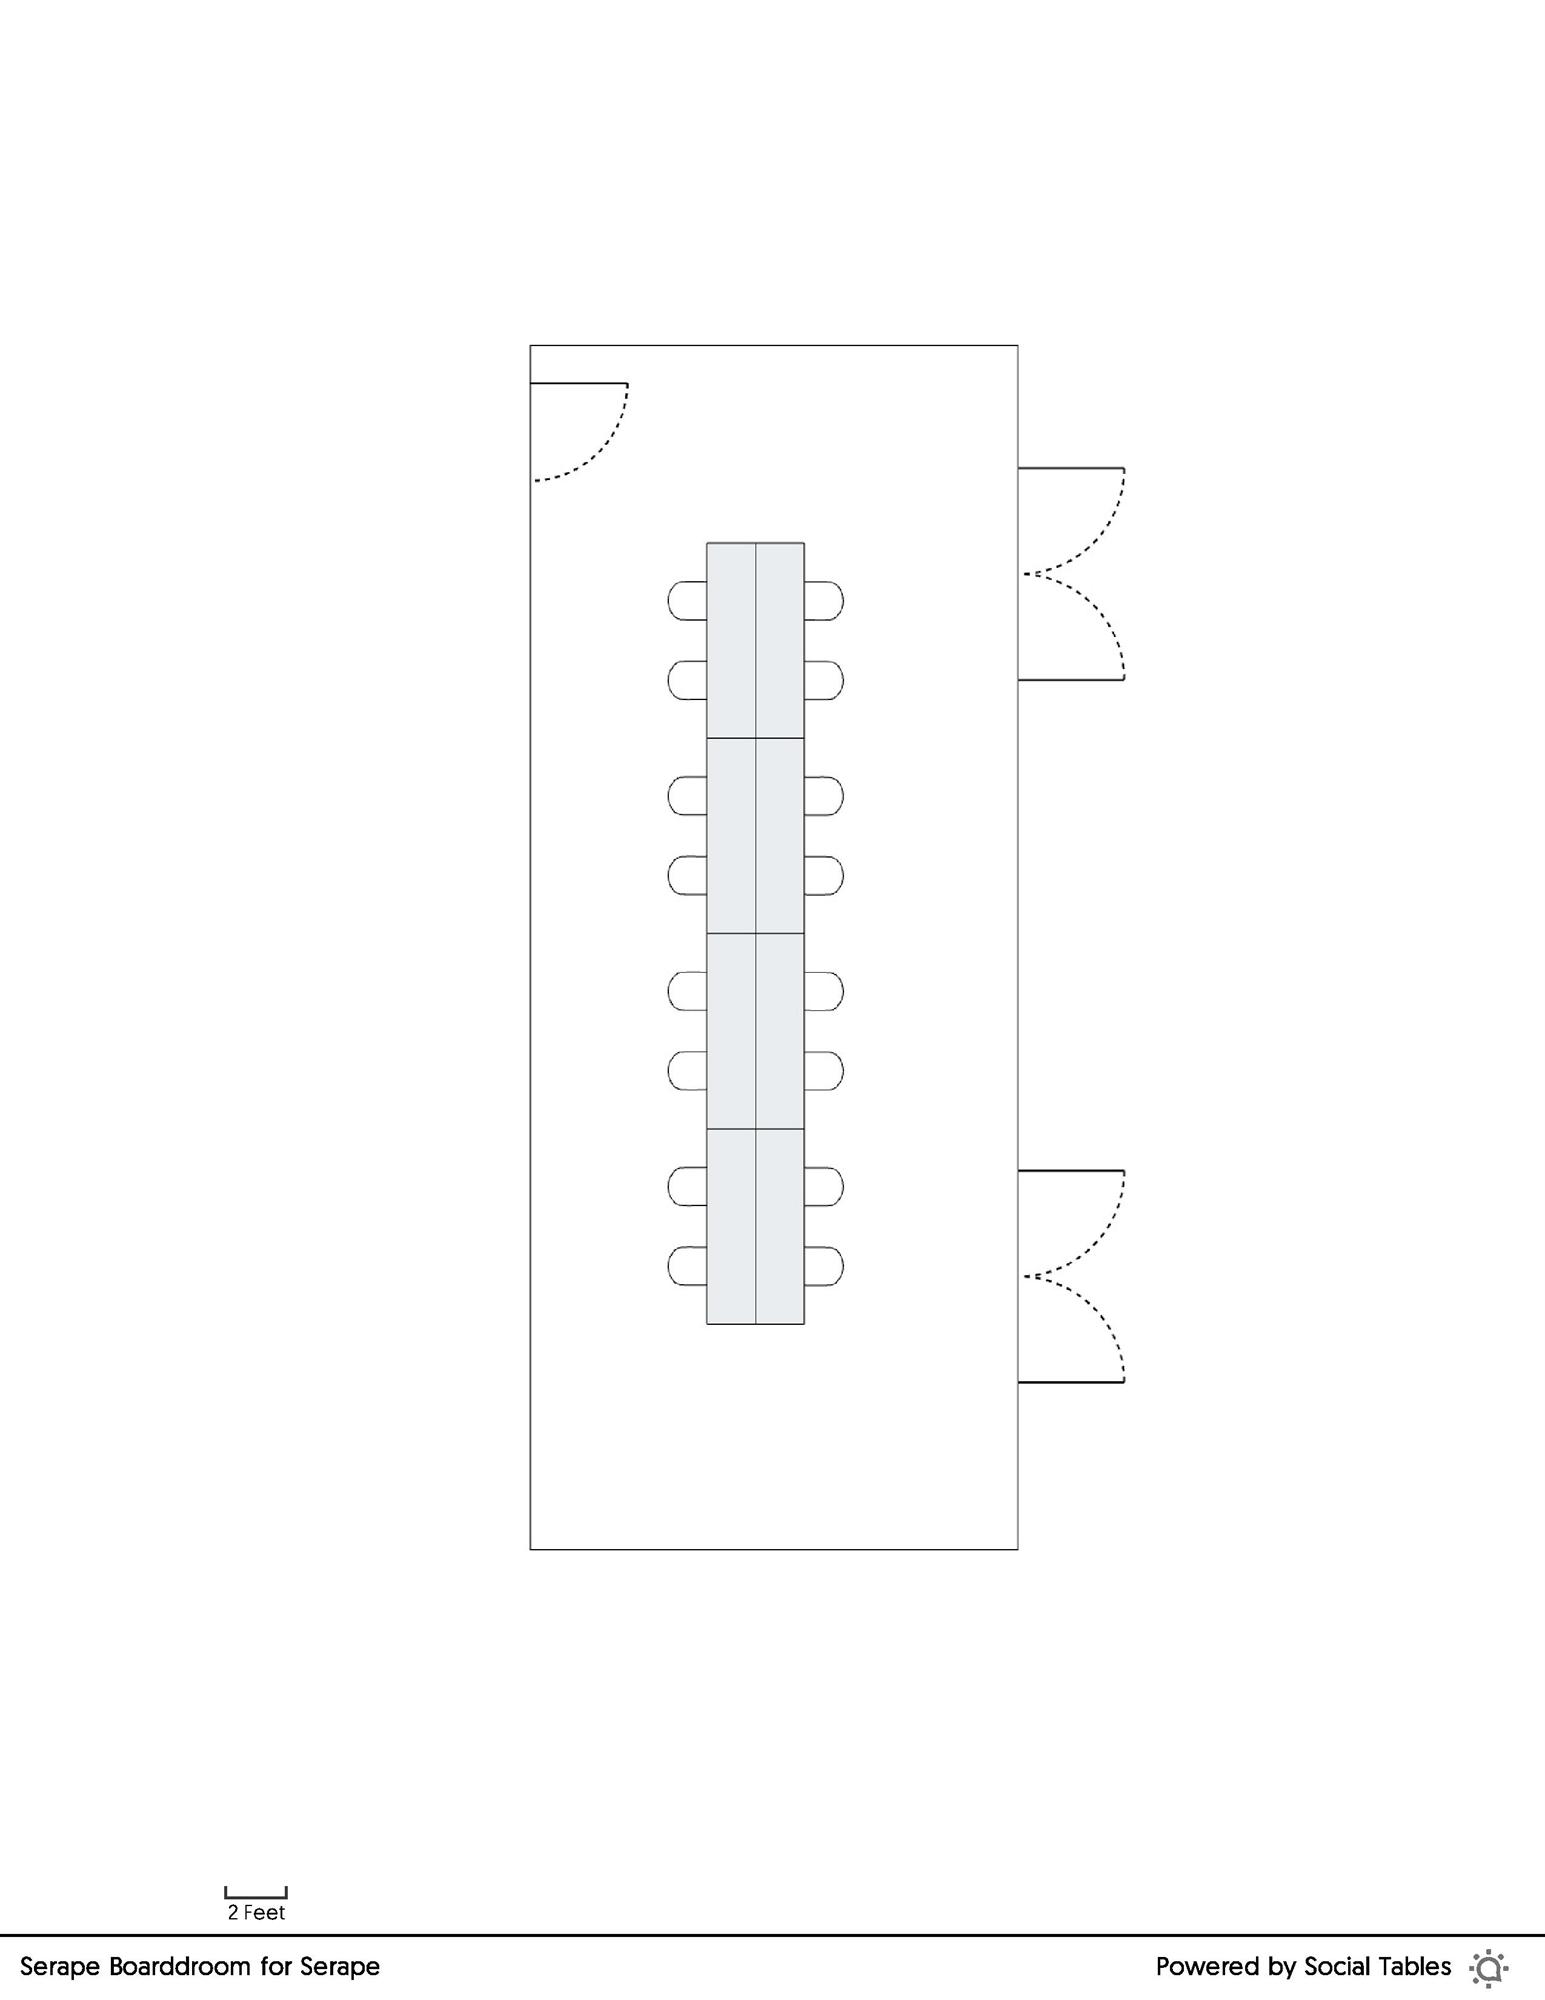 Serape Boardroom floorplan